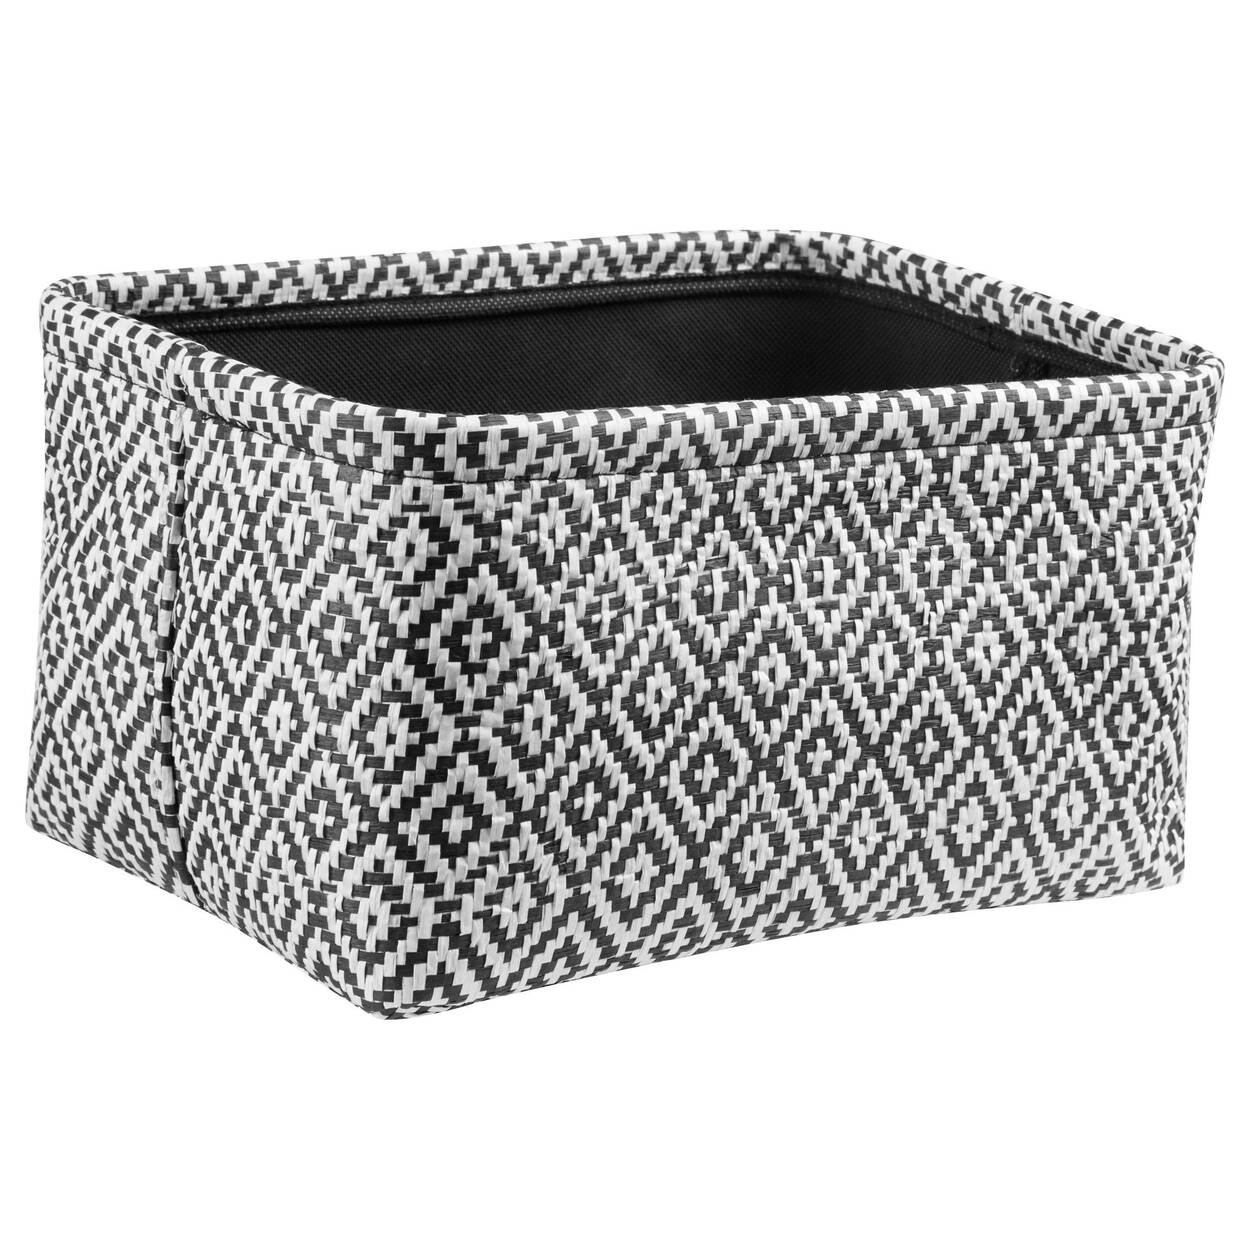 Black and White Storage Basket